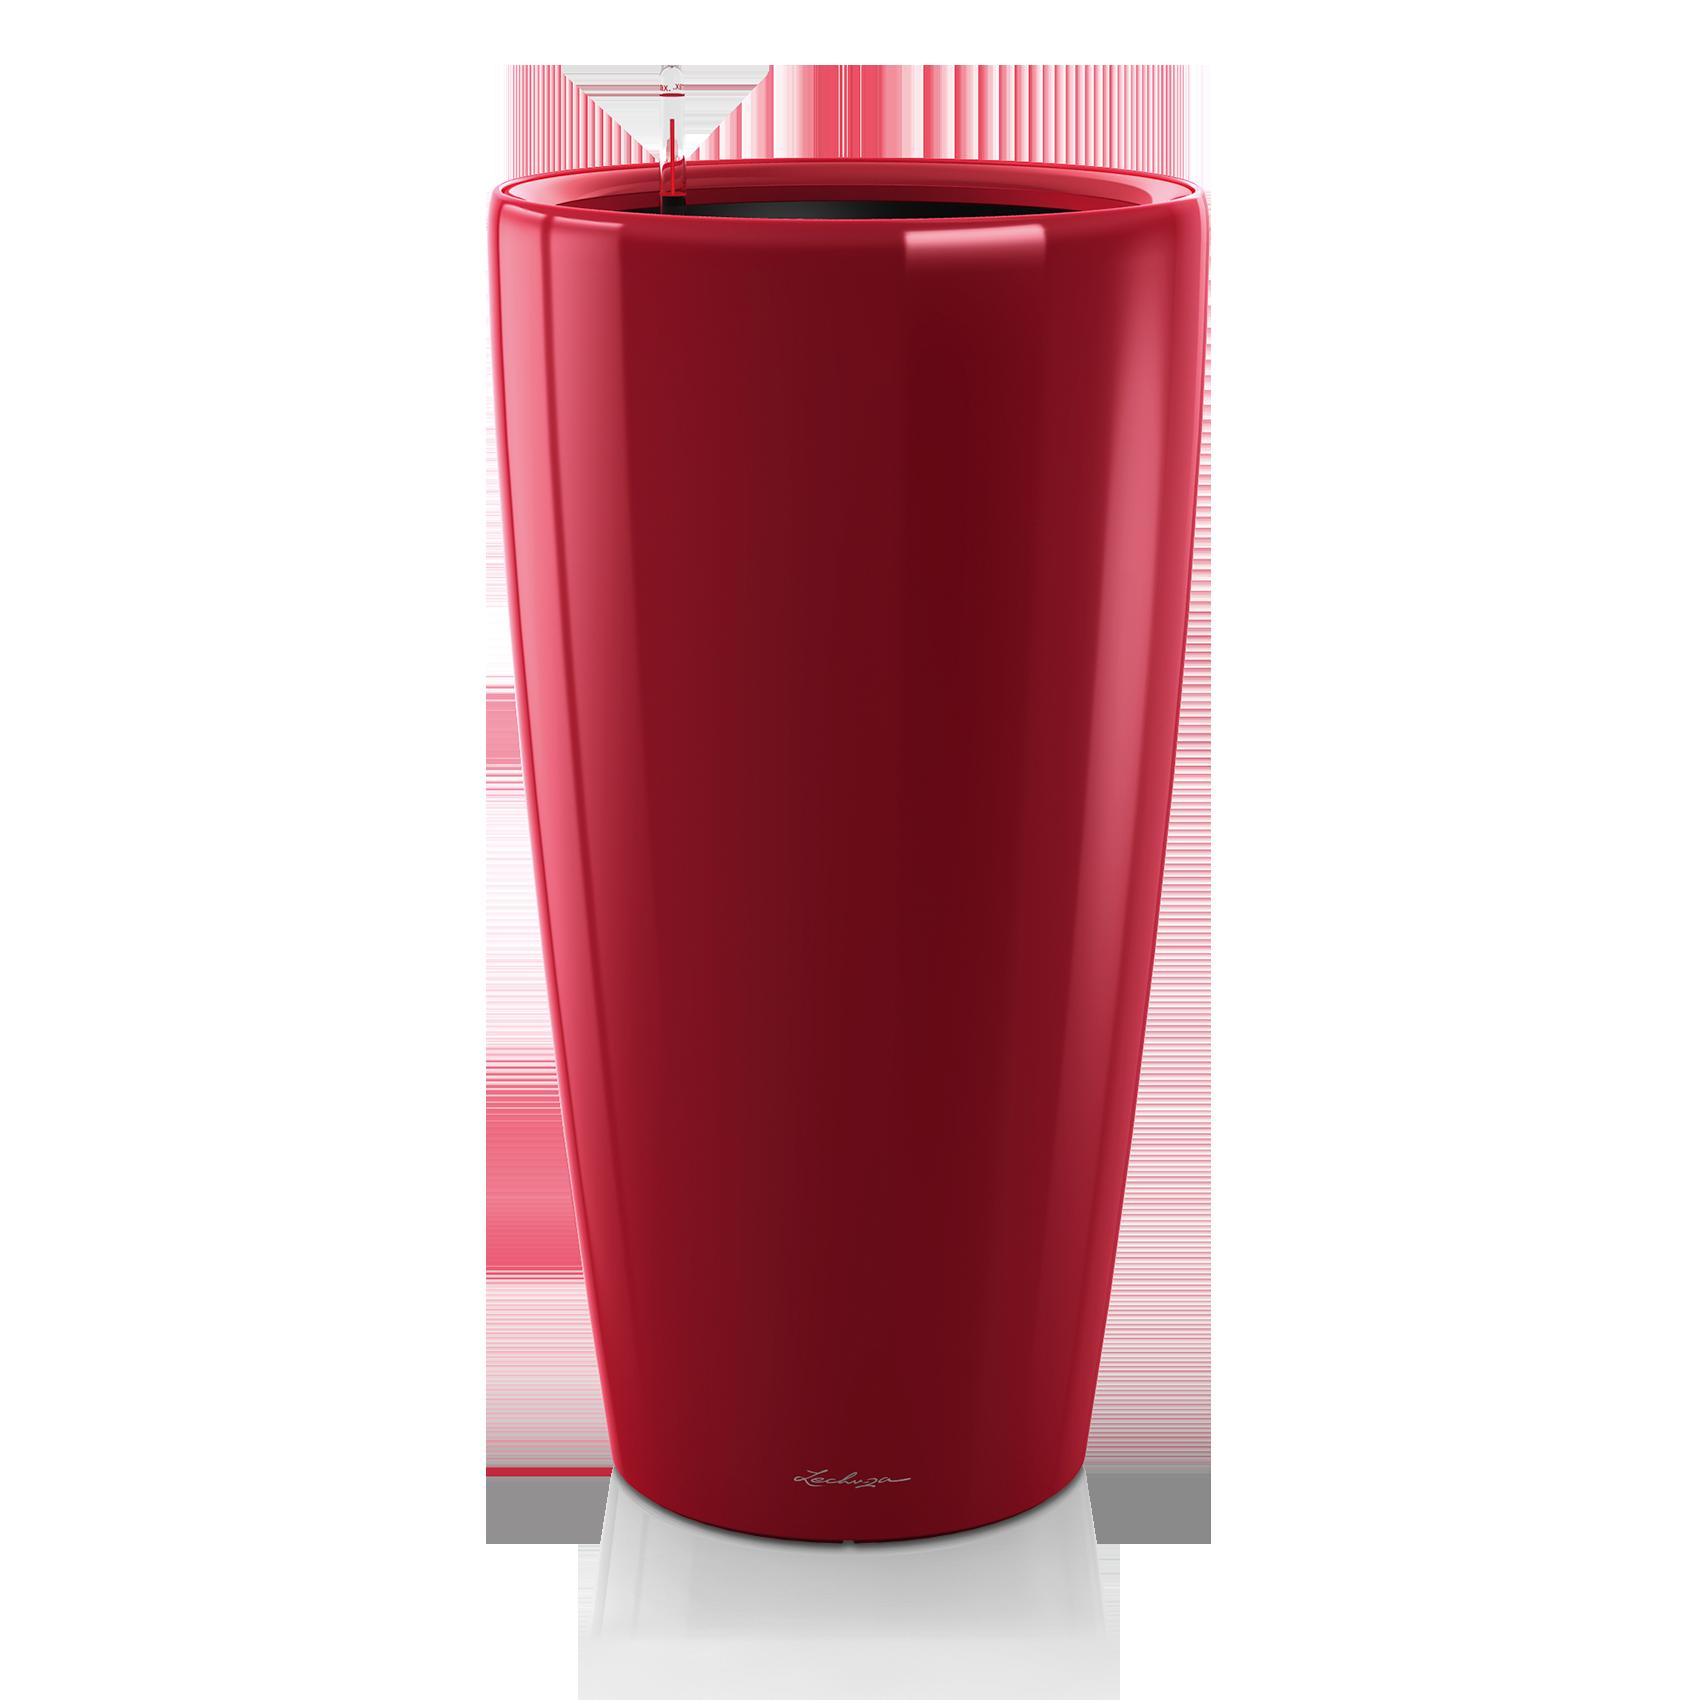 RONDO 32 scarlet rot hochglanz